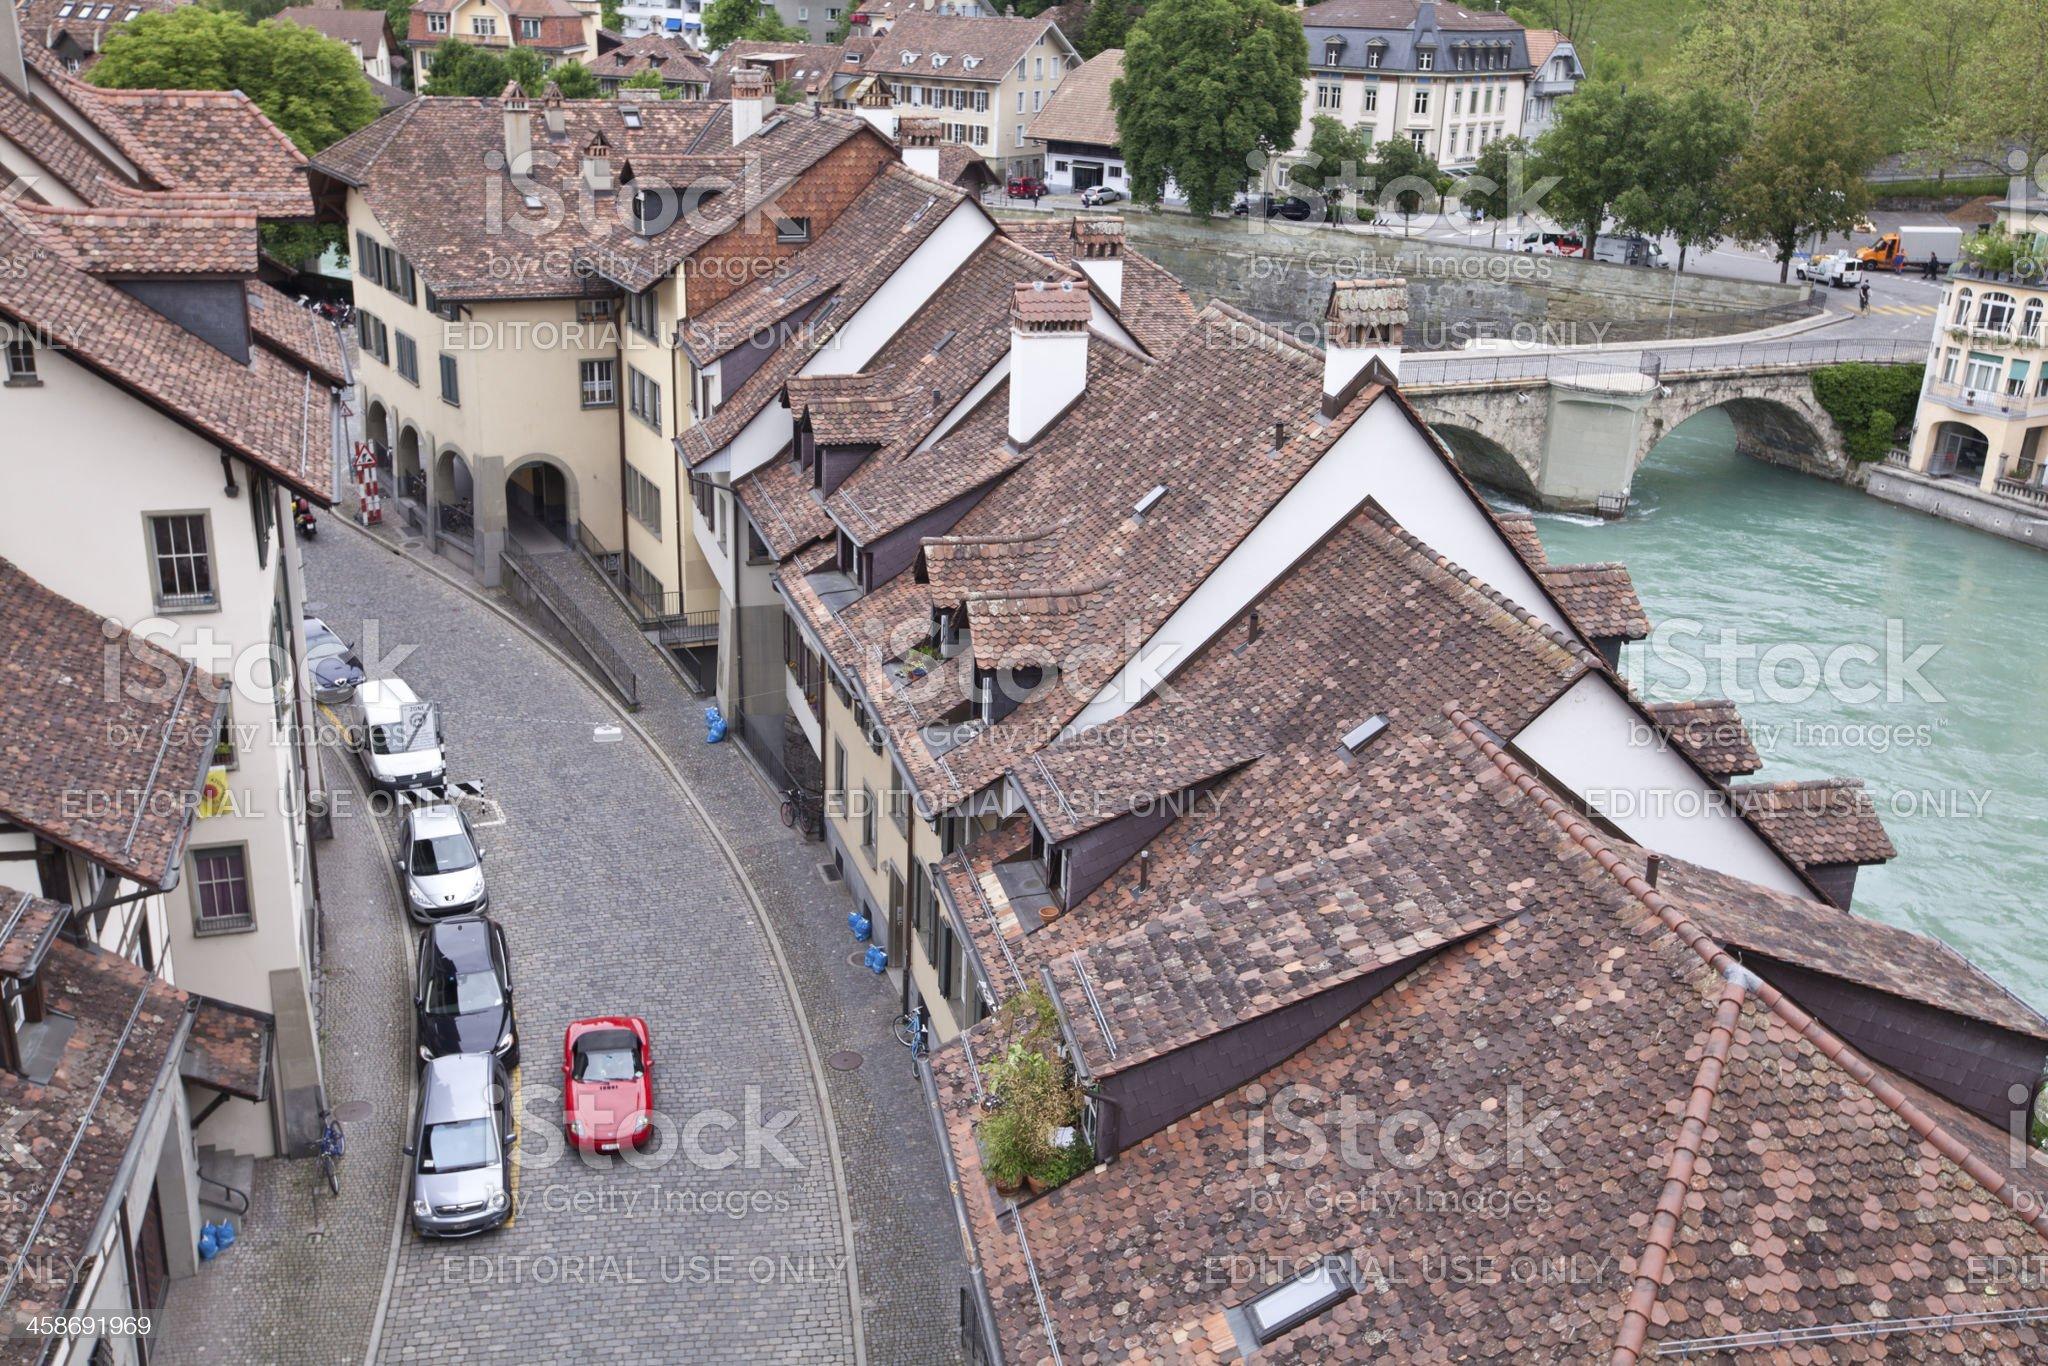 Bern Switzerland royalty-free stock photo